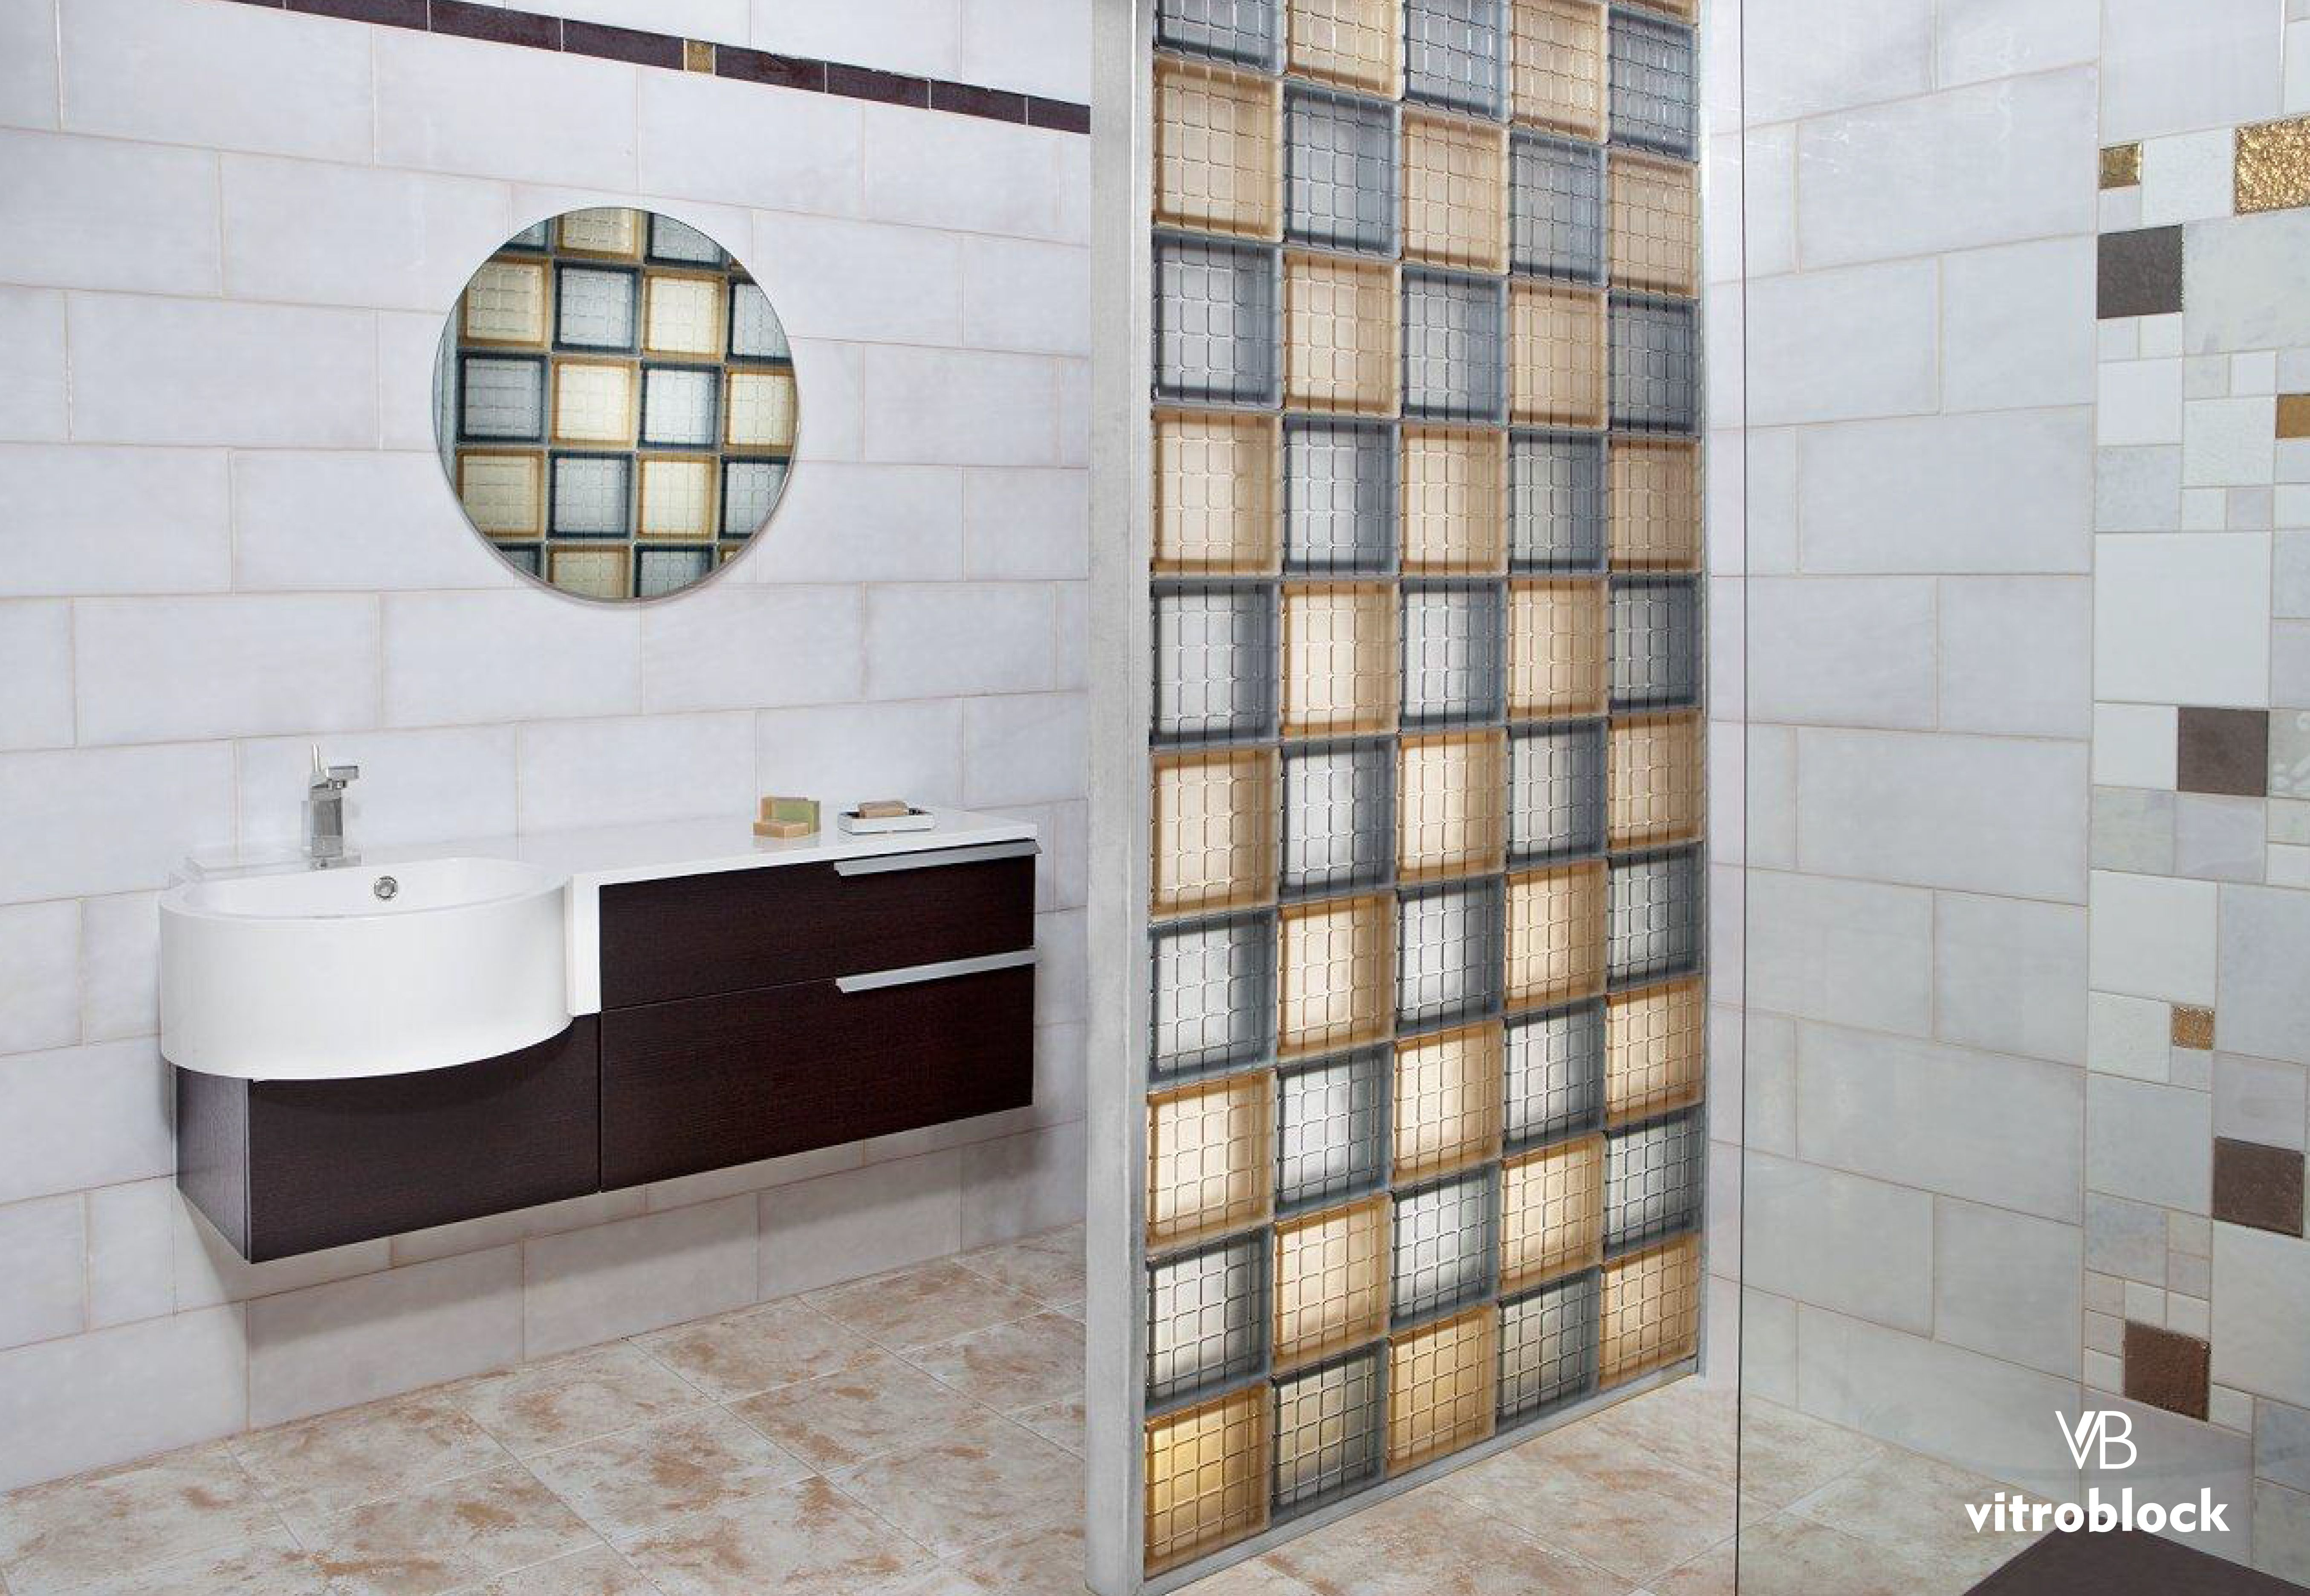 Pared divisoria de ladrillo de vidrio mosaico 3d en toilette vitroblock ladrillodevidrio - Bloques de vidrio para bano ...